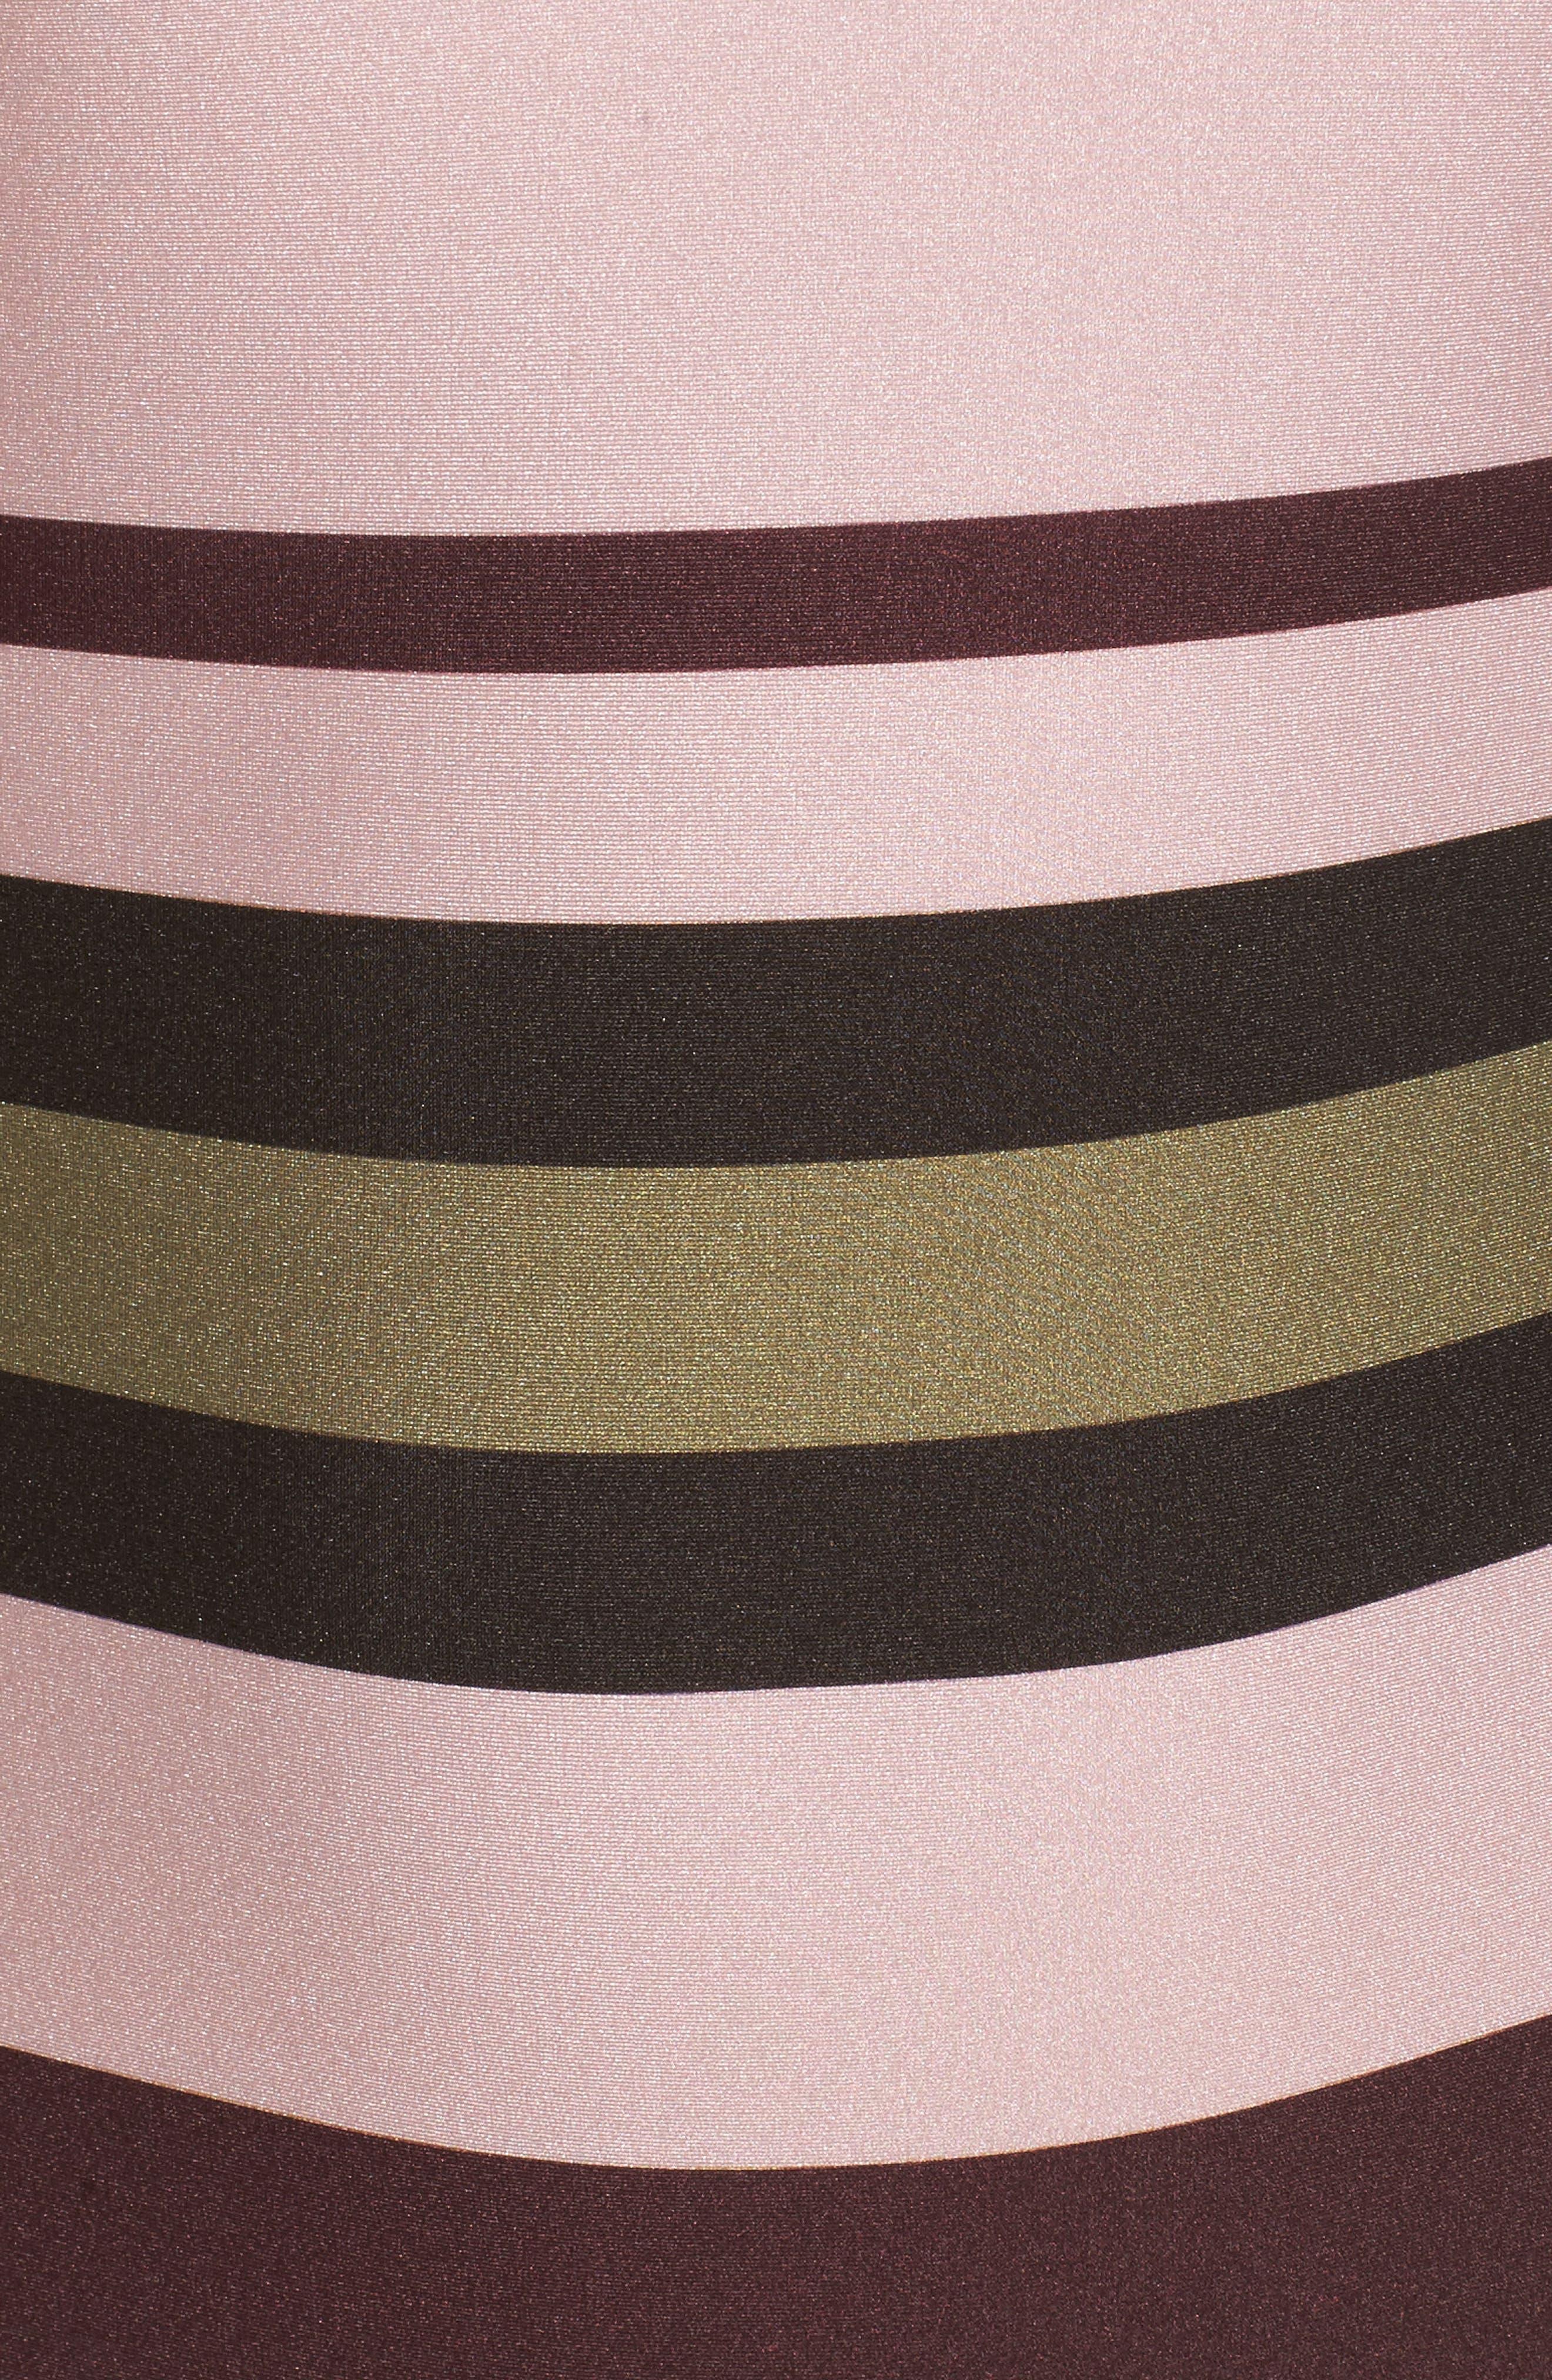 Imperial Stripe Bardot One-Piece Swimsuit,                             Alternate thumbnail 5, color,                             Dusky Pink